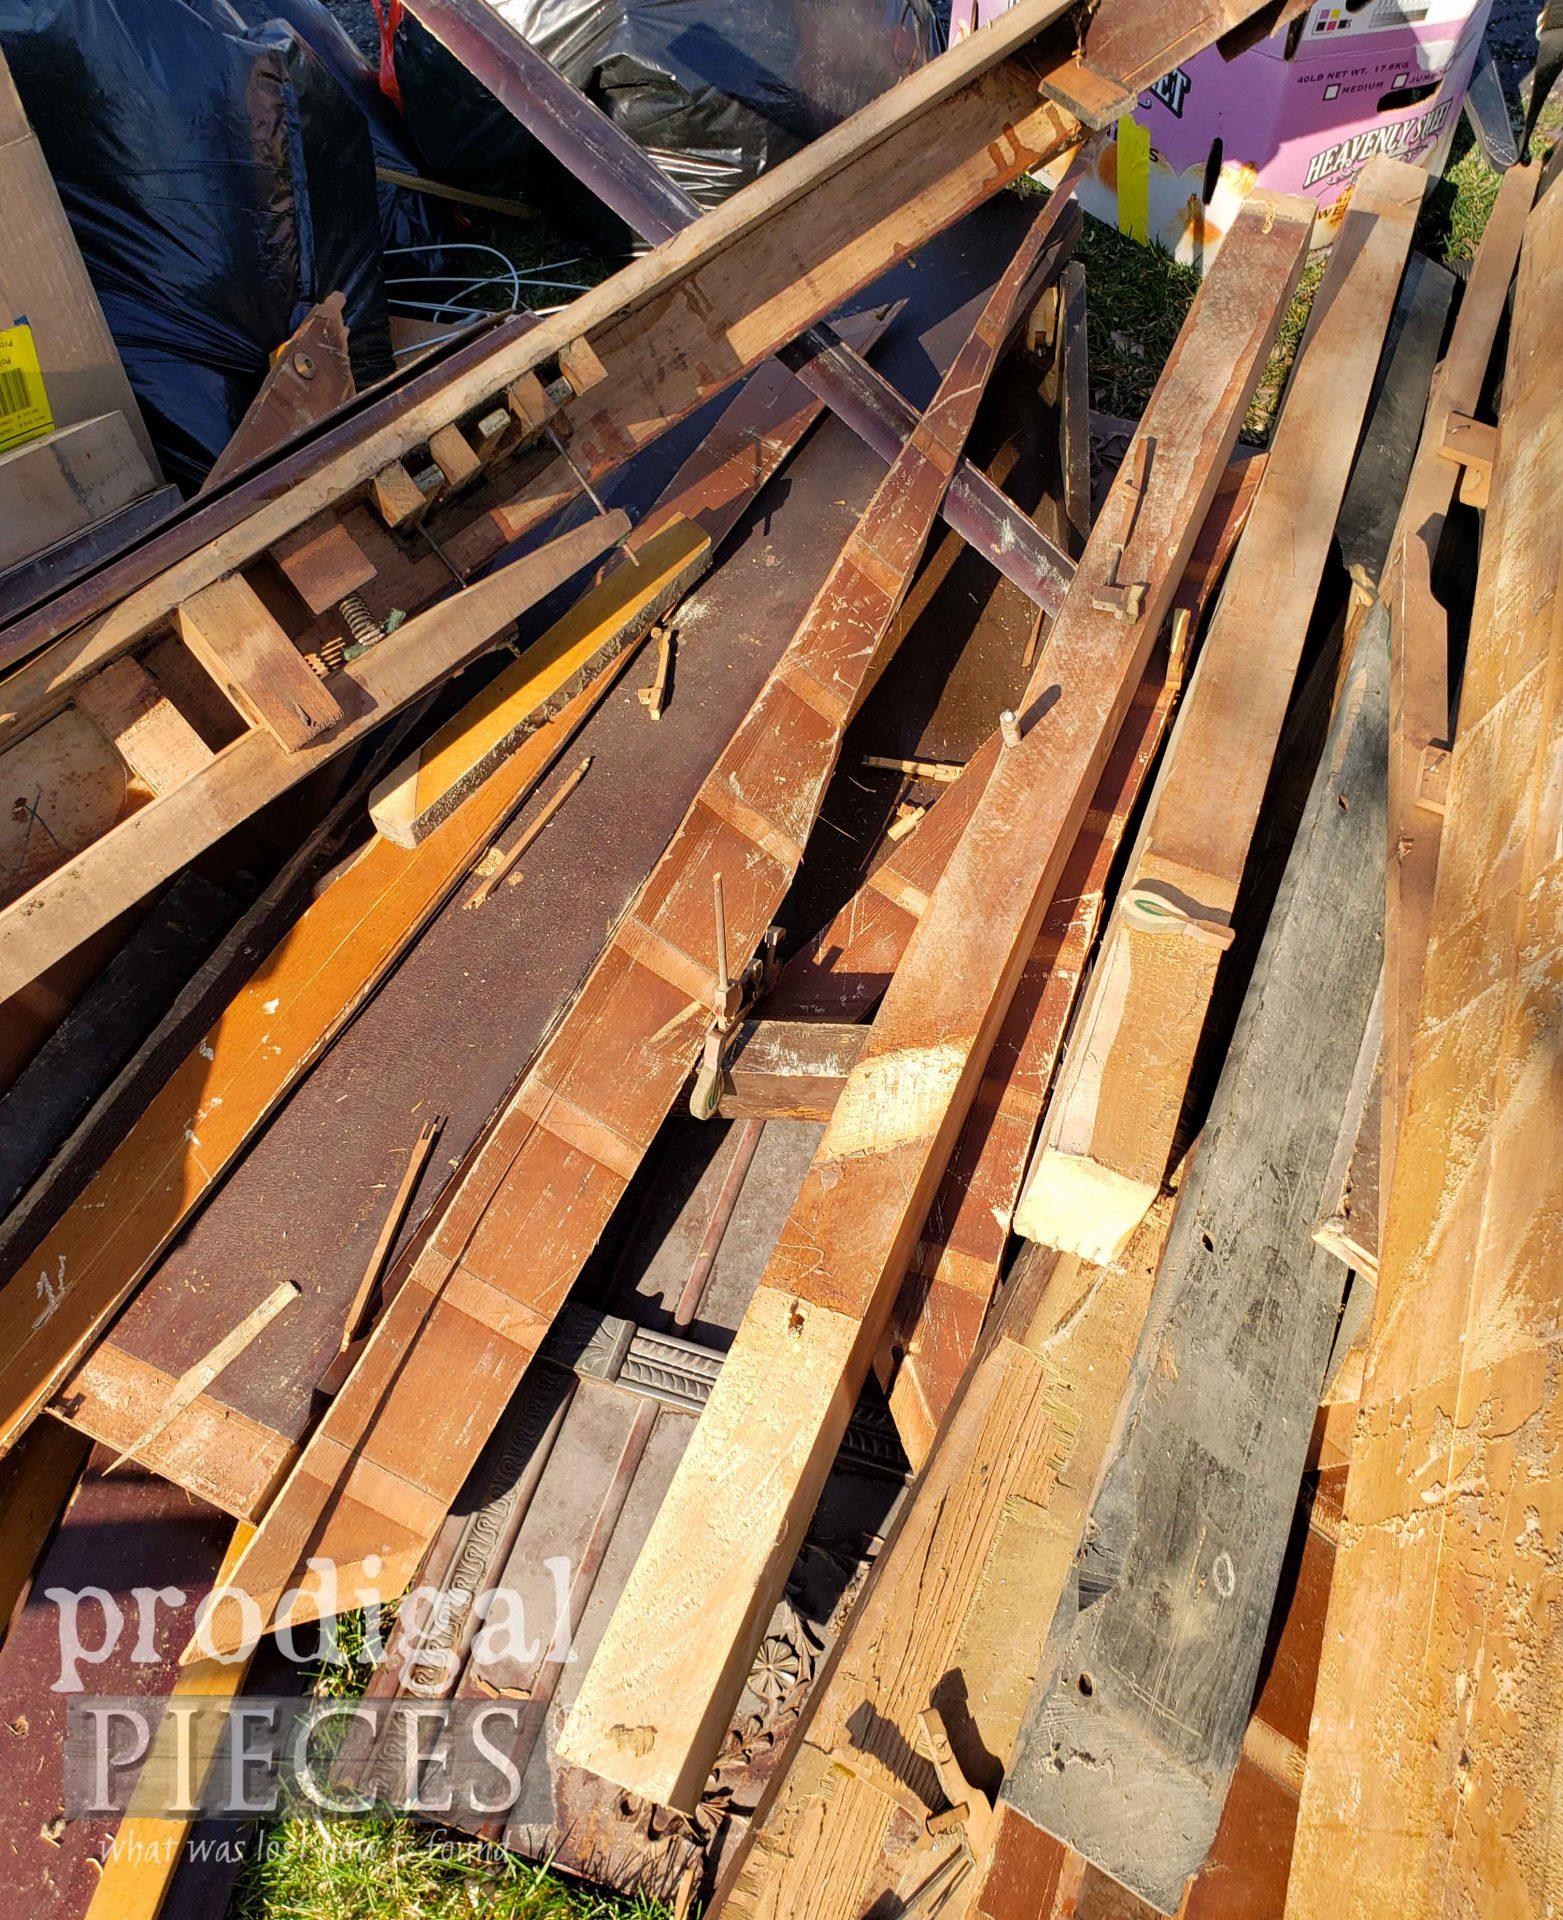 Broken Up Piano on Curb   prodigalpieces.com #prodigalpieces